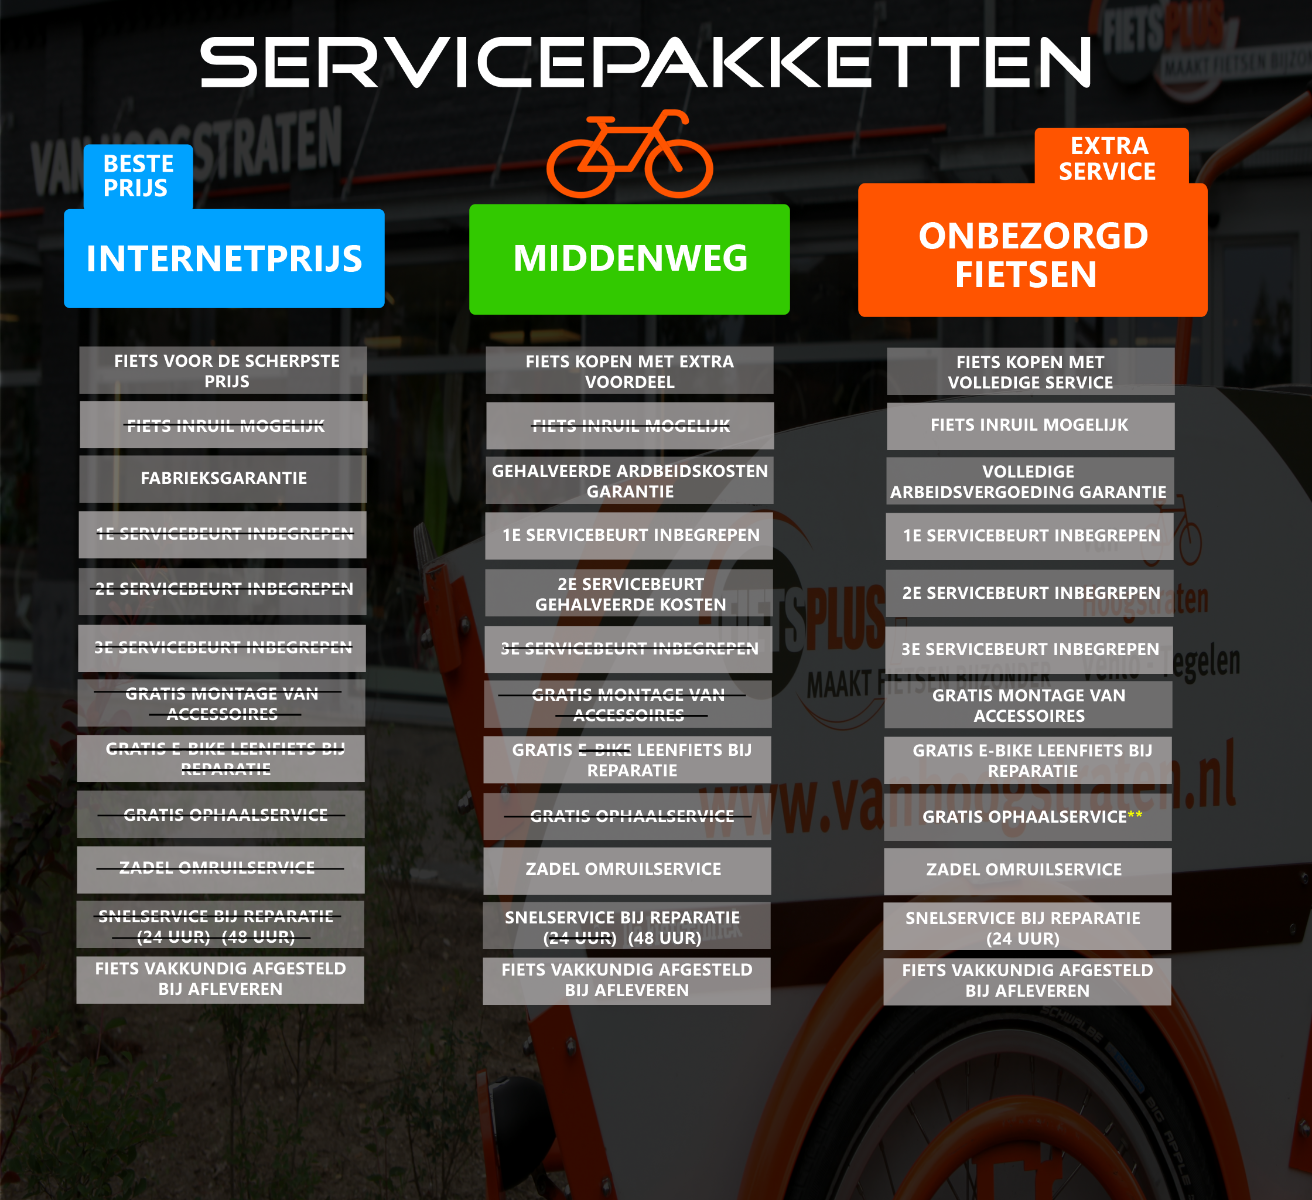 Servicepakketten van Hoogstraten